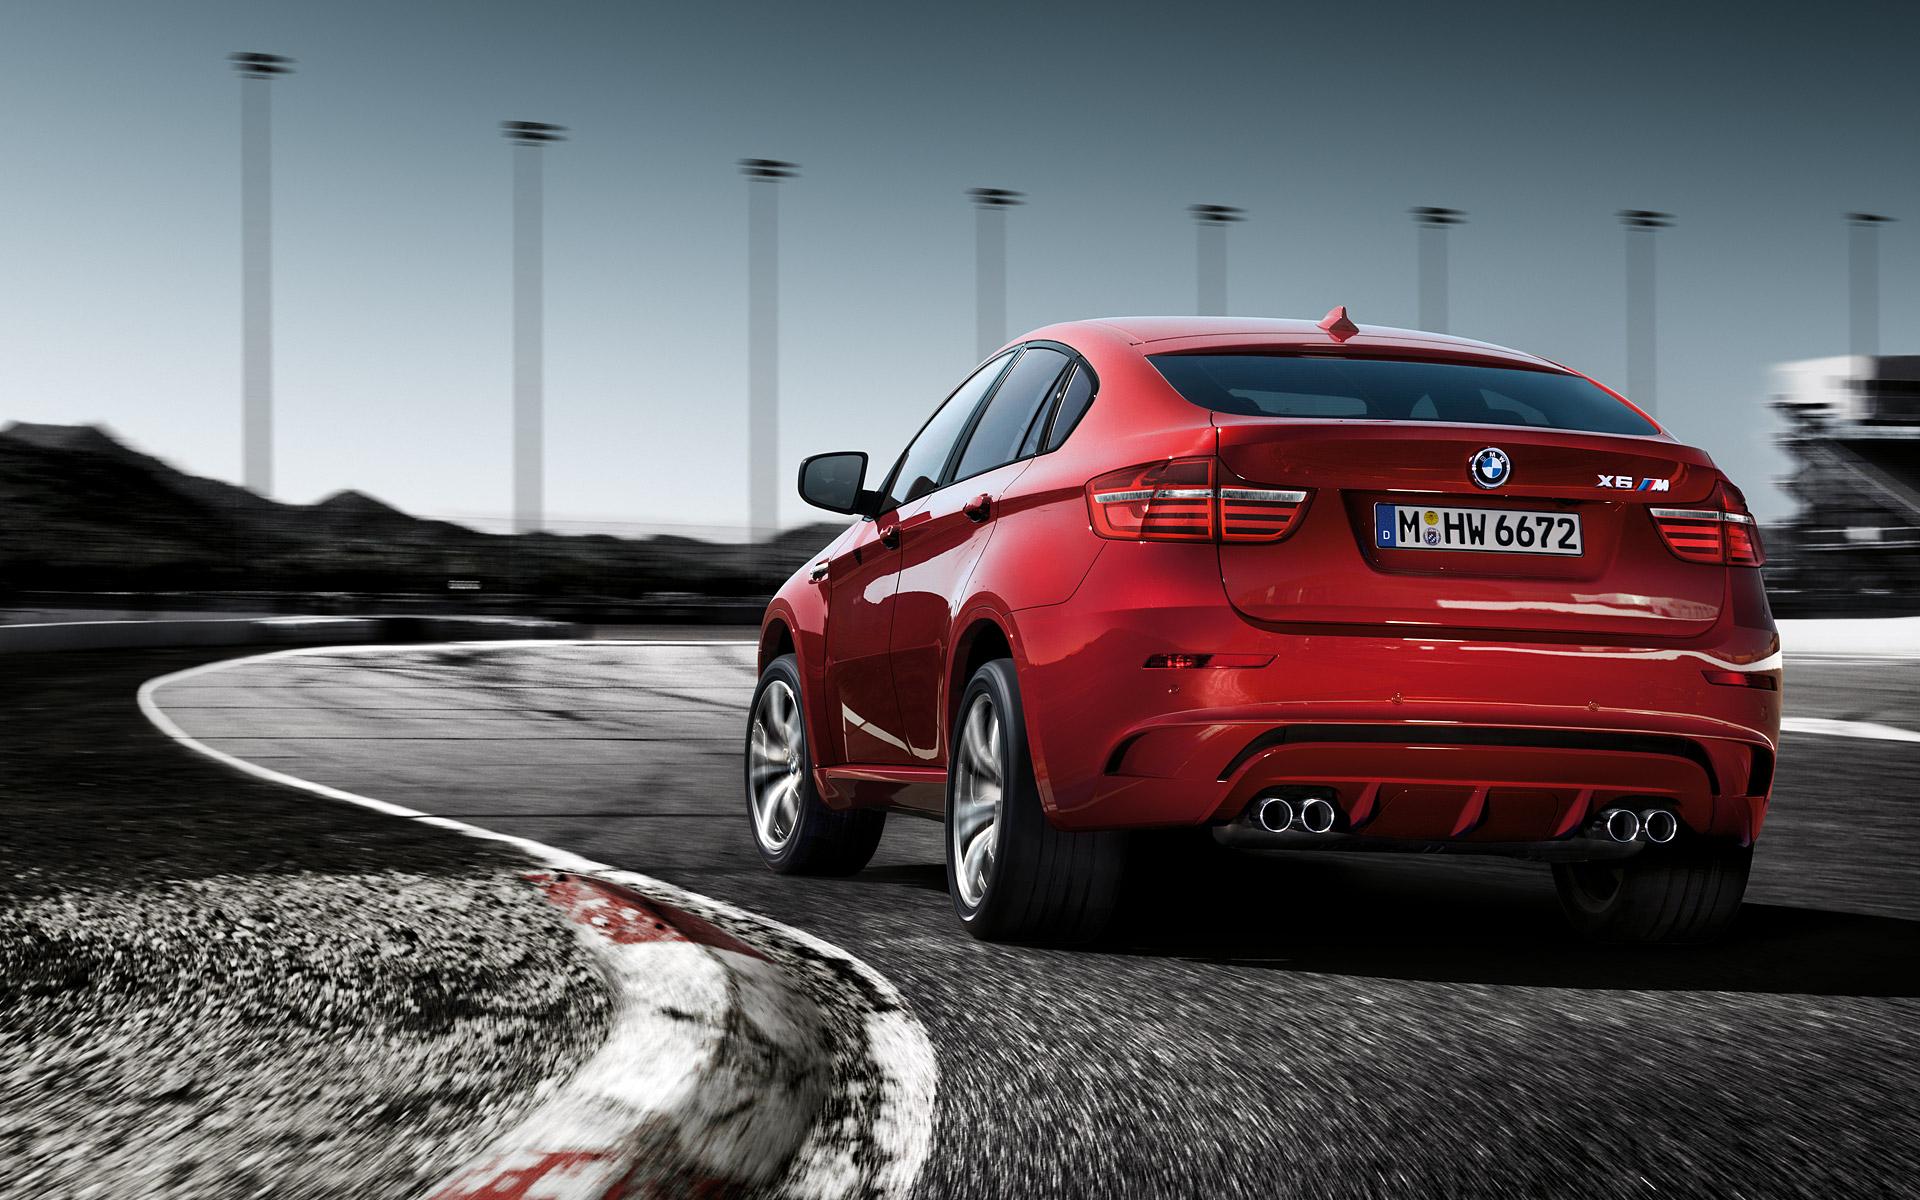 2013 BMW X6M Review - Video